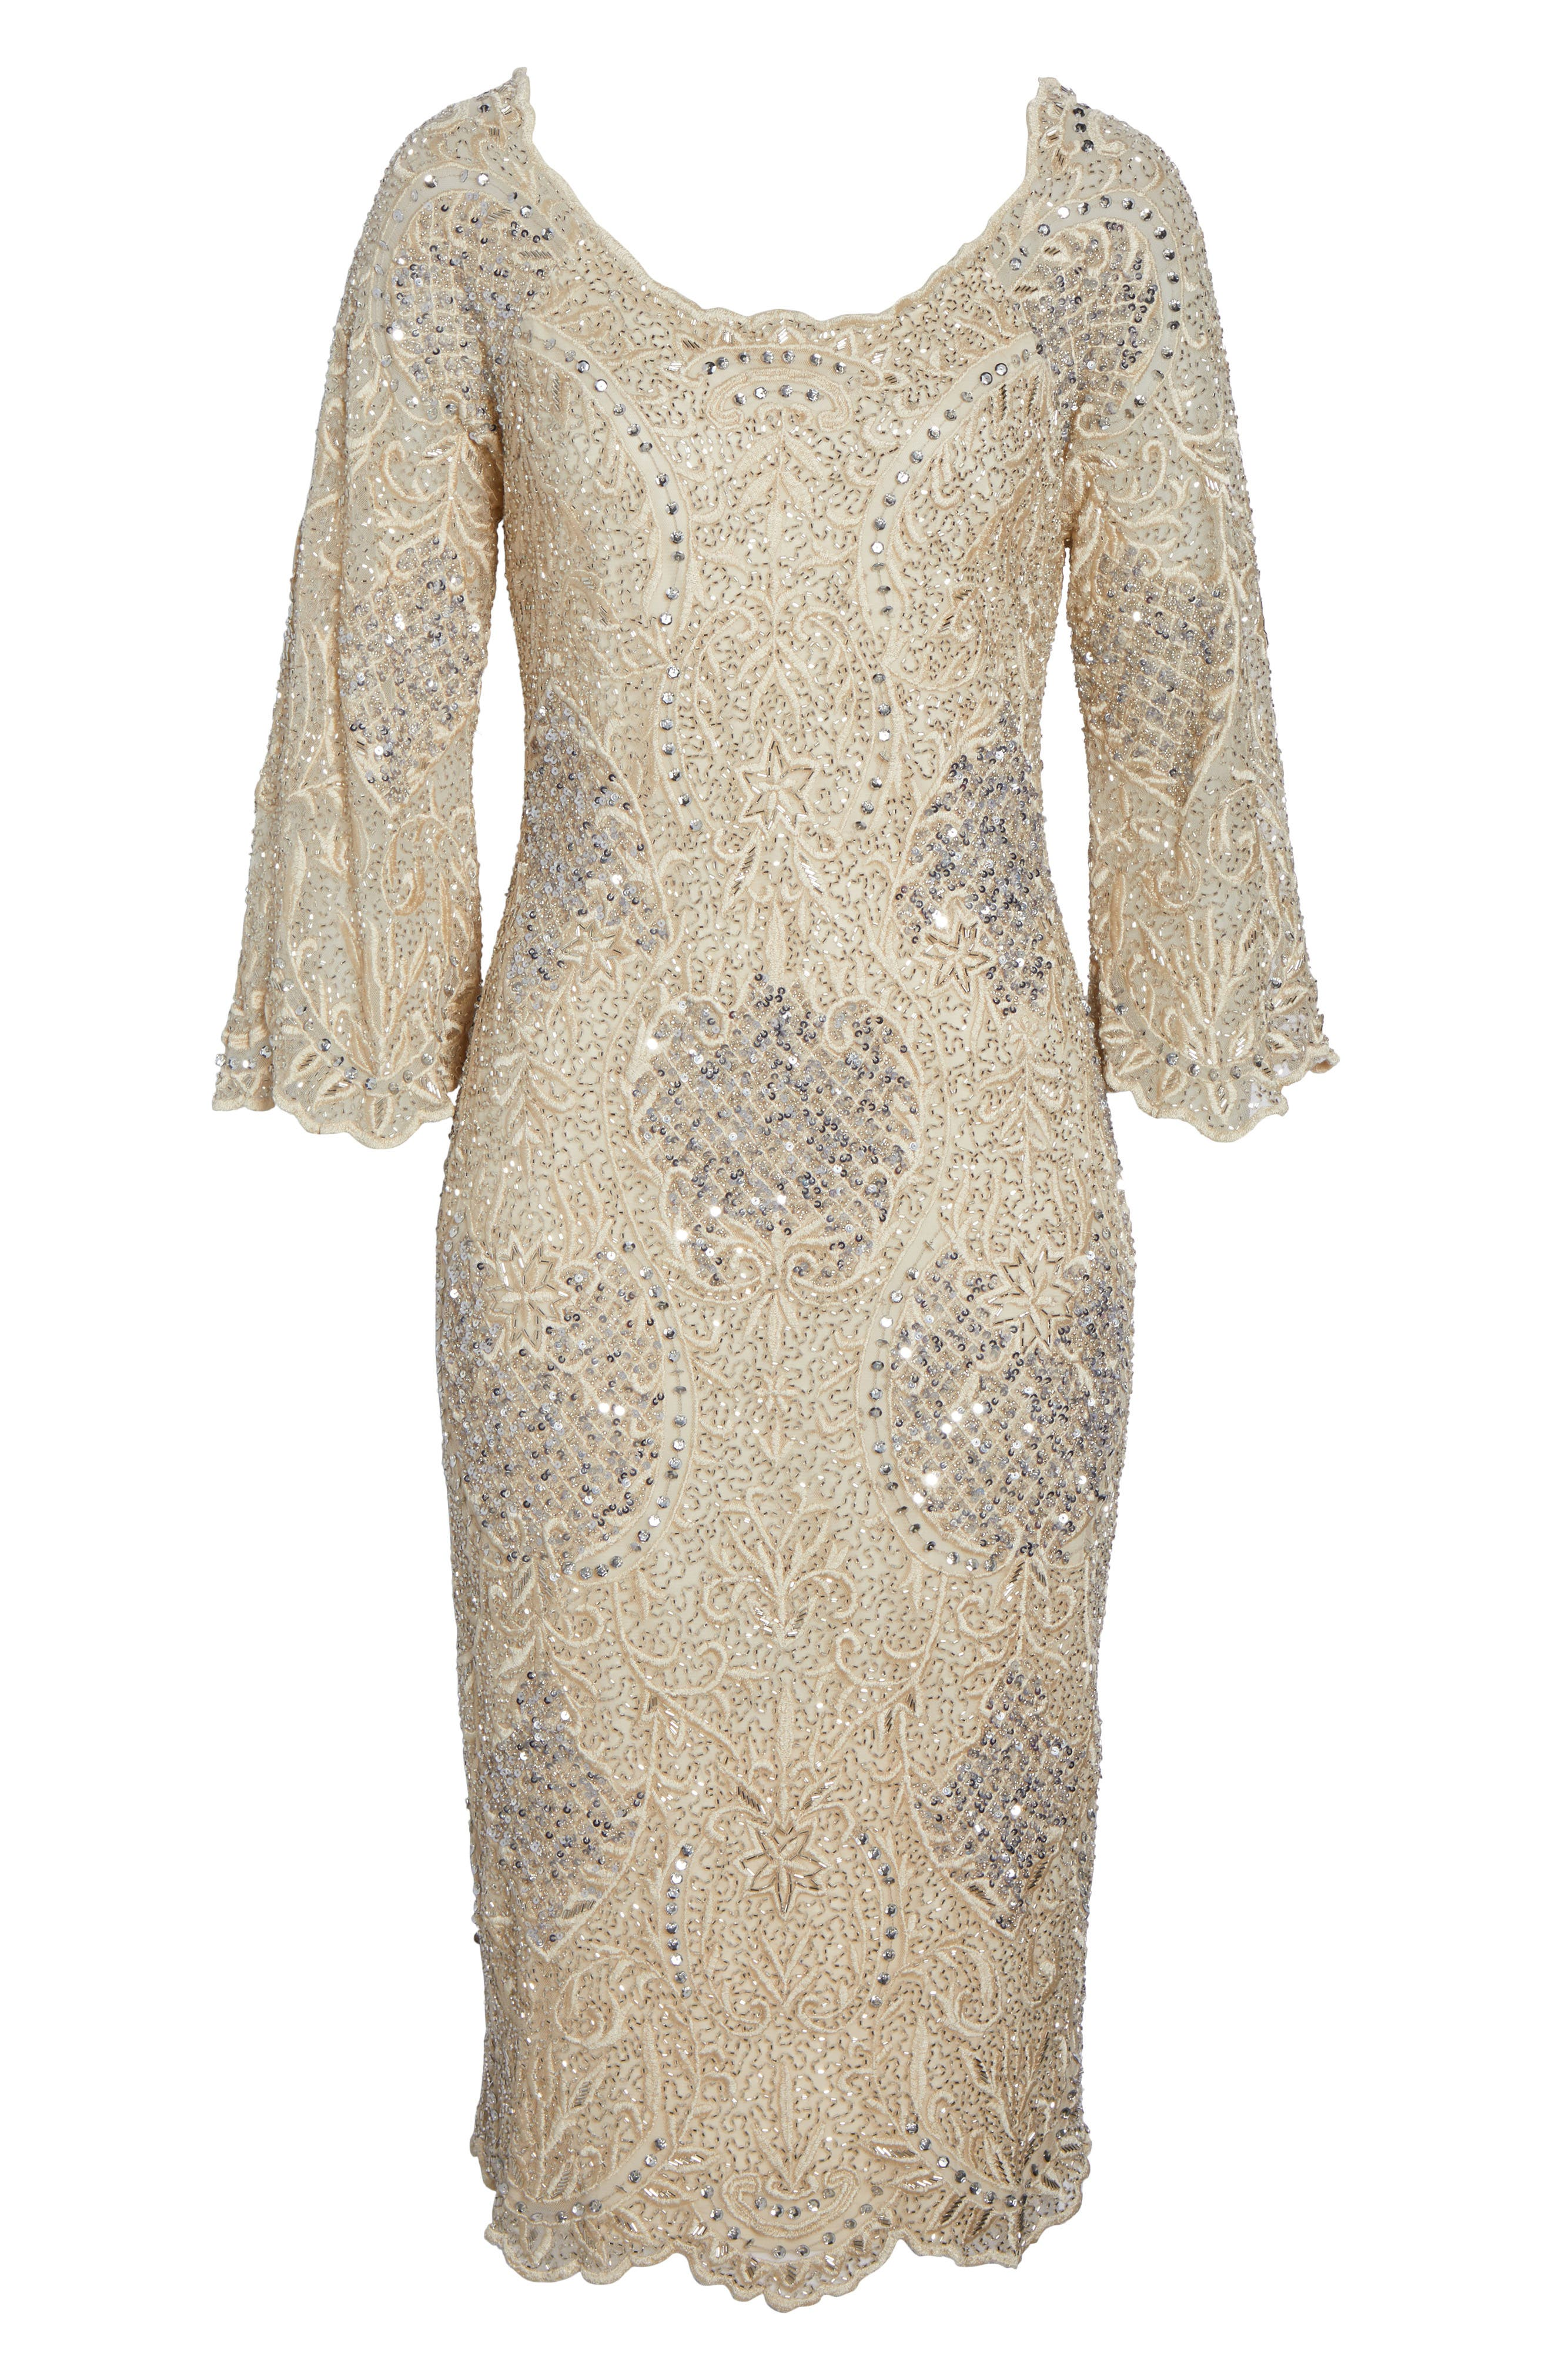 Embroidered Scallop Edge Midi Sheath Dress,                             Alternate thumbnail 6, color,                             Champagne